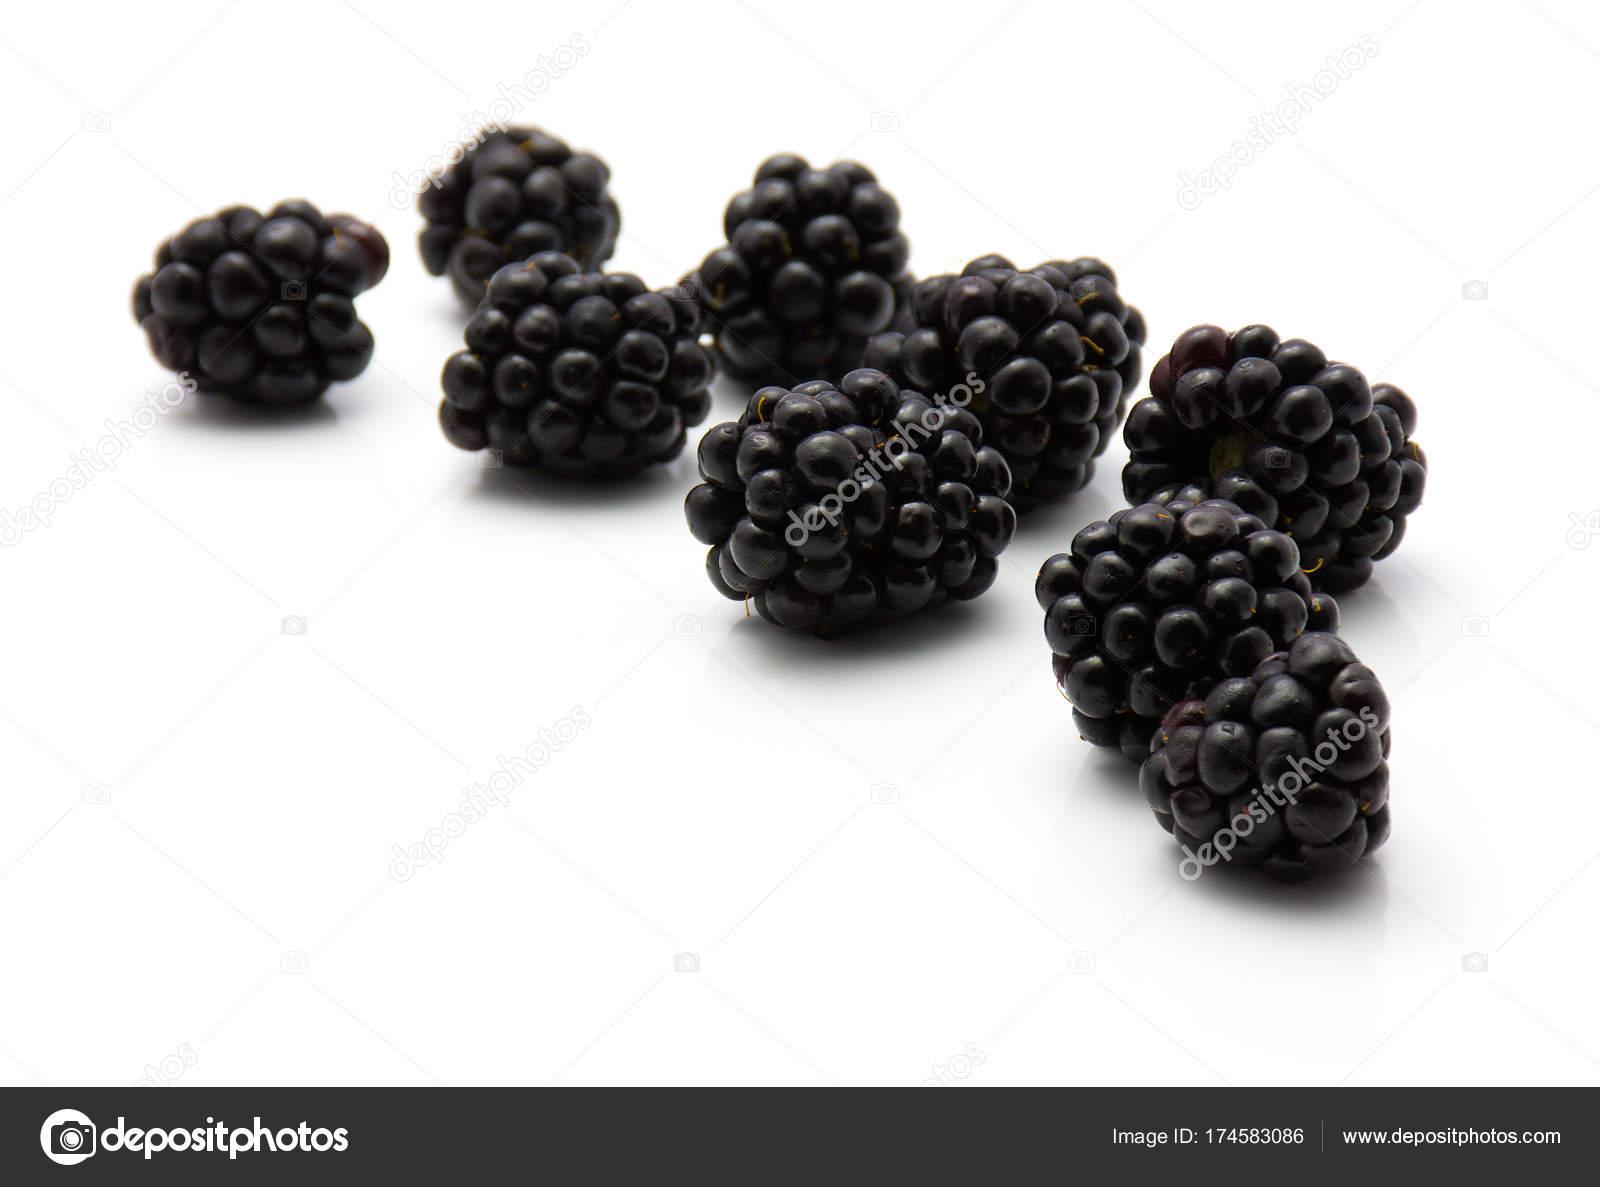 Kingconvert blackberry torch 9800 video converter 5. 3 full version.